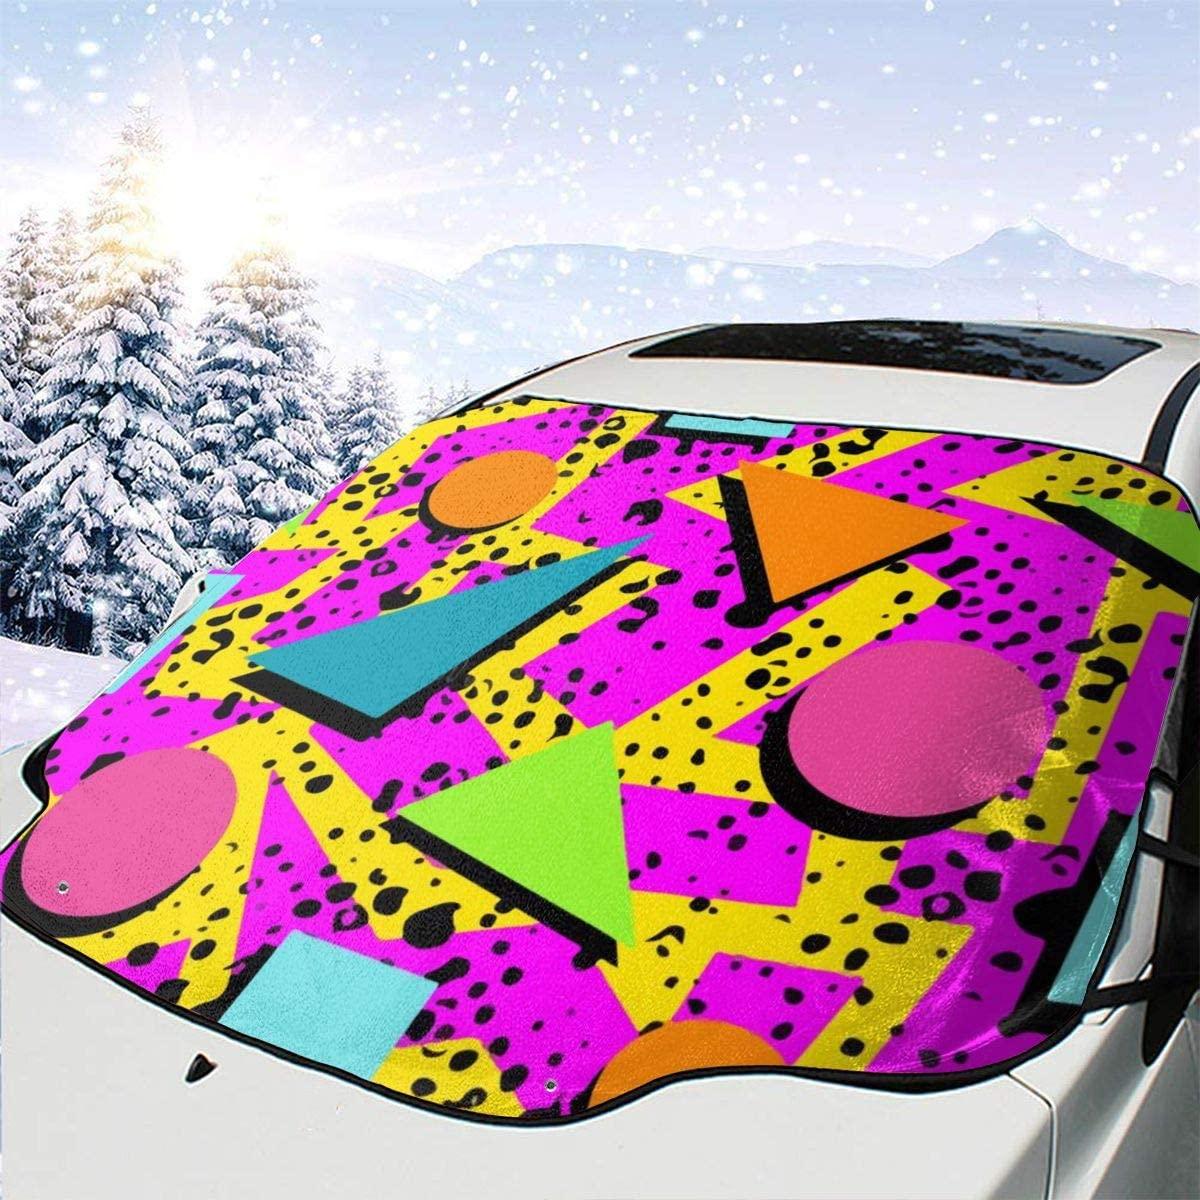 THONFIRE Car Front Window Windshields Winter Sunshade Vintage 80s Memphis Cover Sand Proof Blocks UV Rays Damage Free Visor Protector Automobile Spring Heatshield